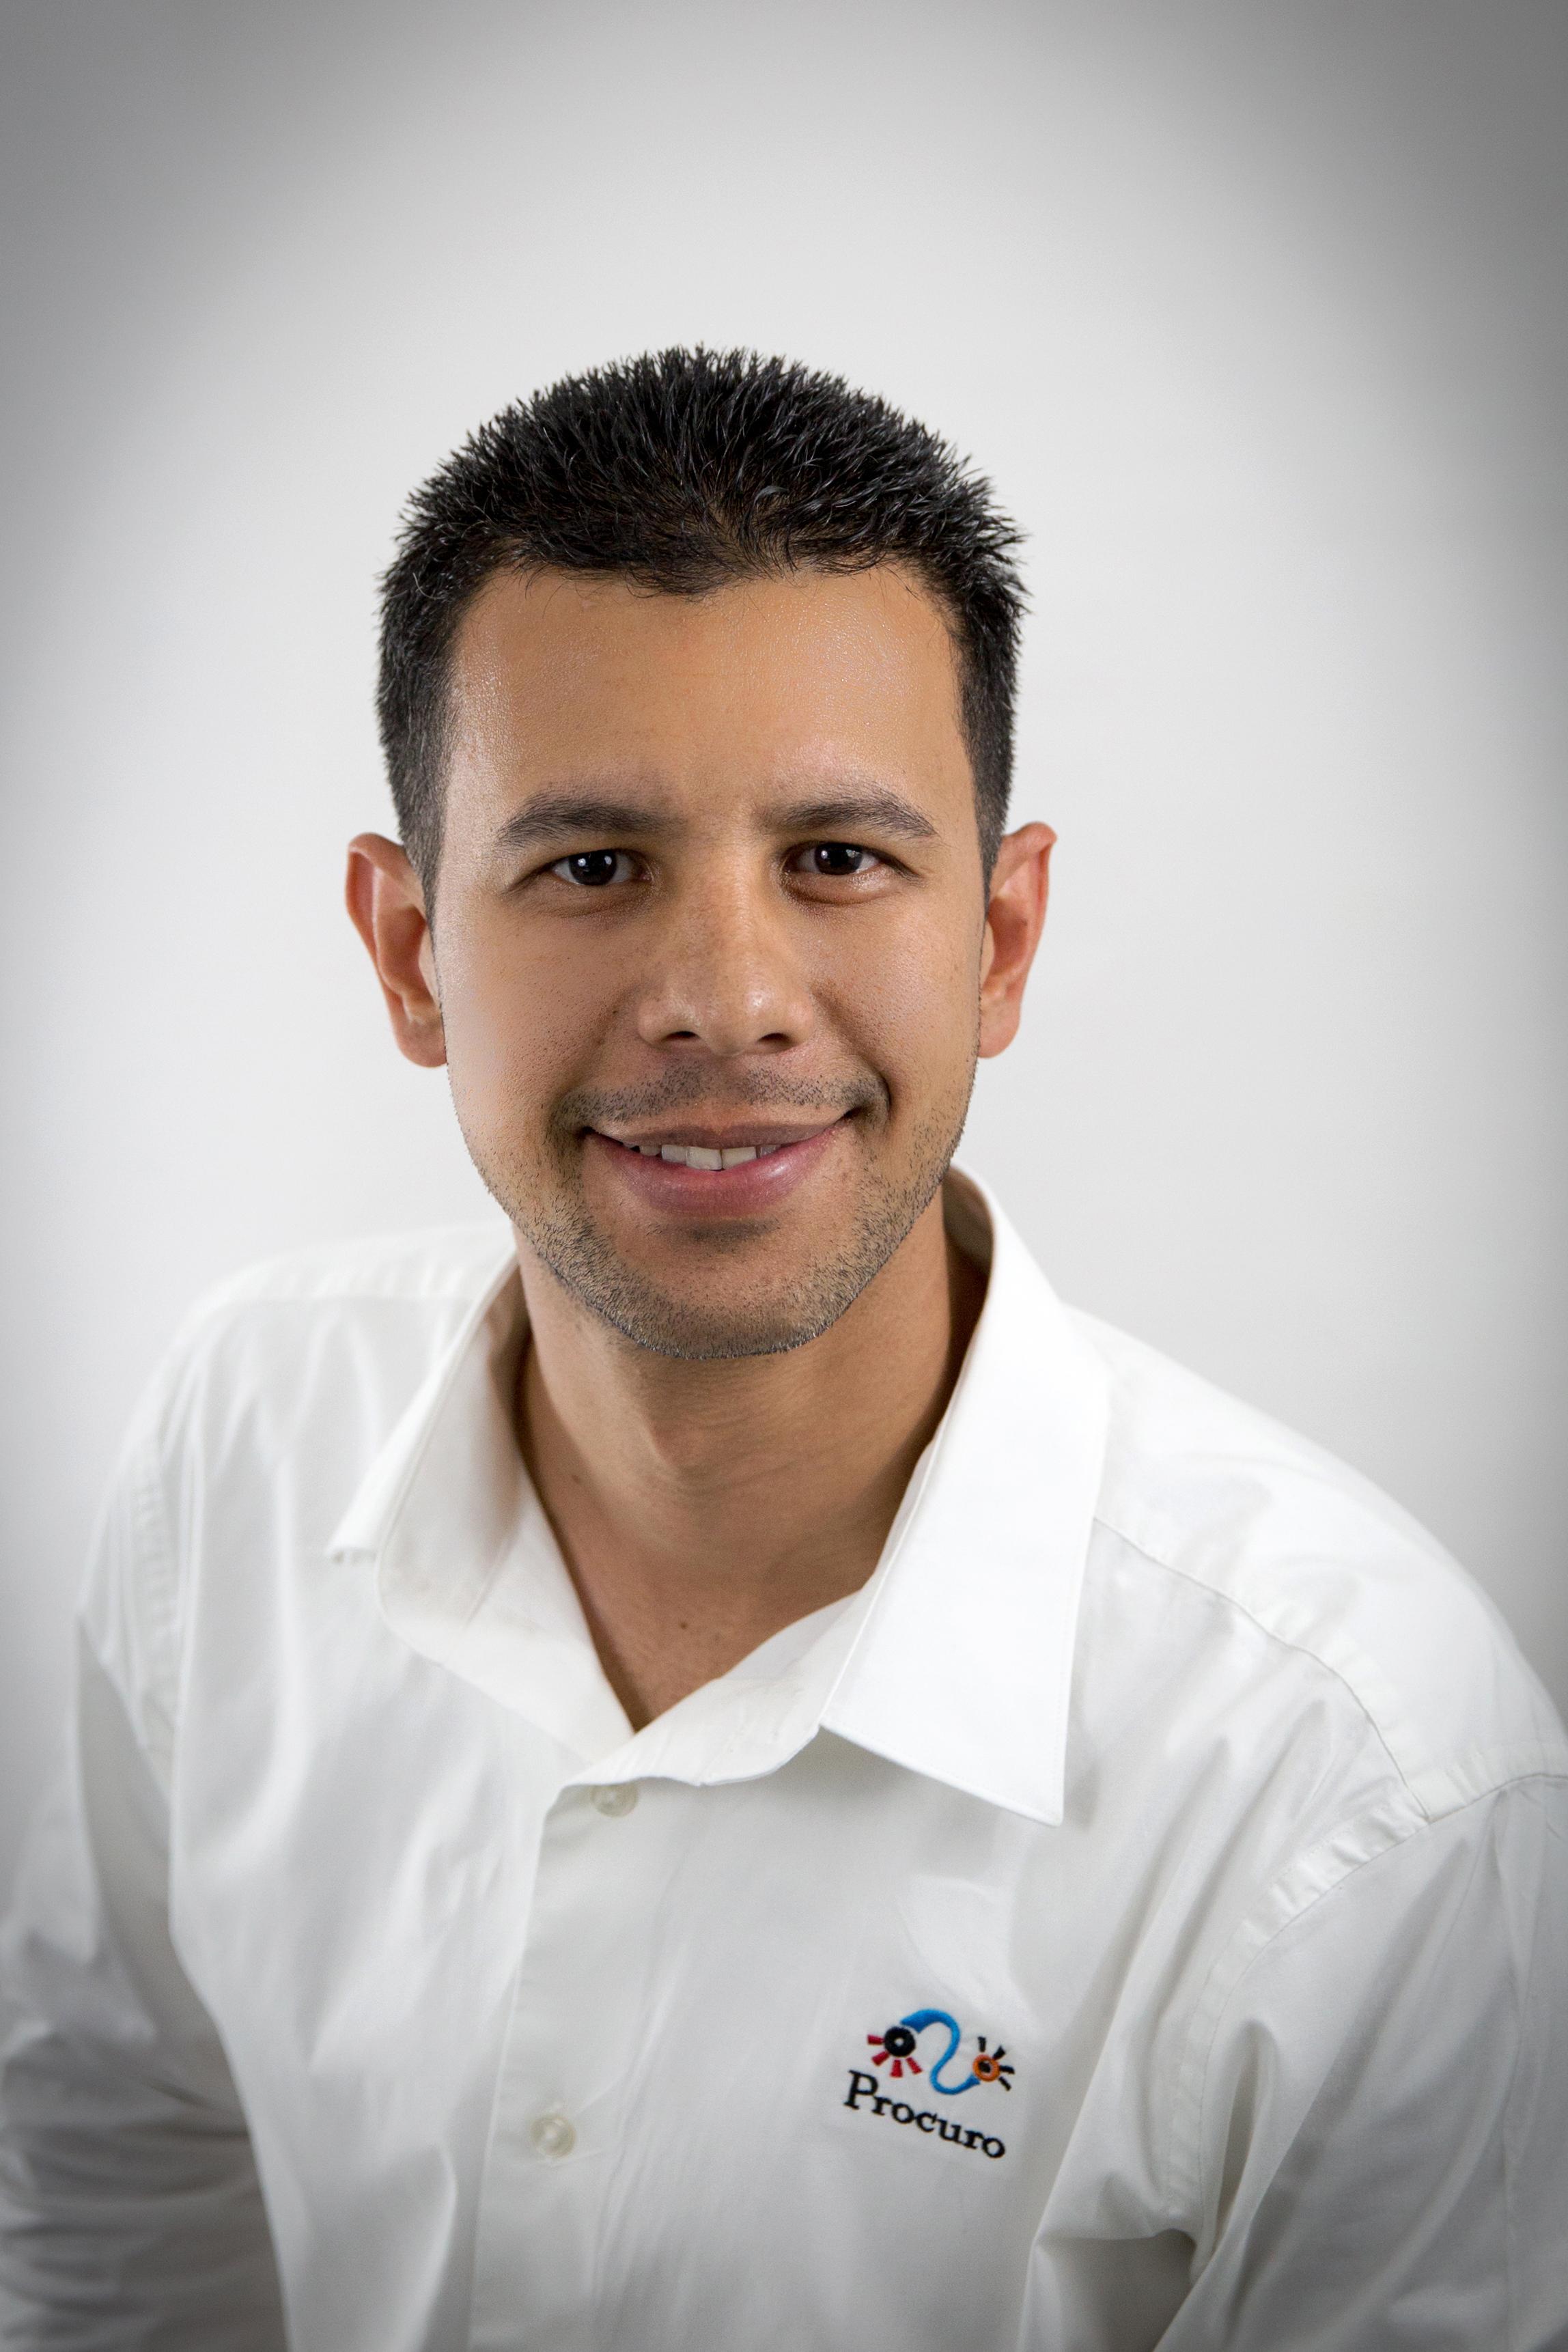 Juan Carlos Lau